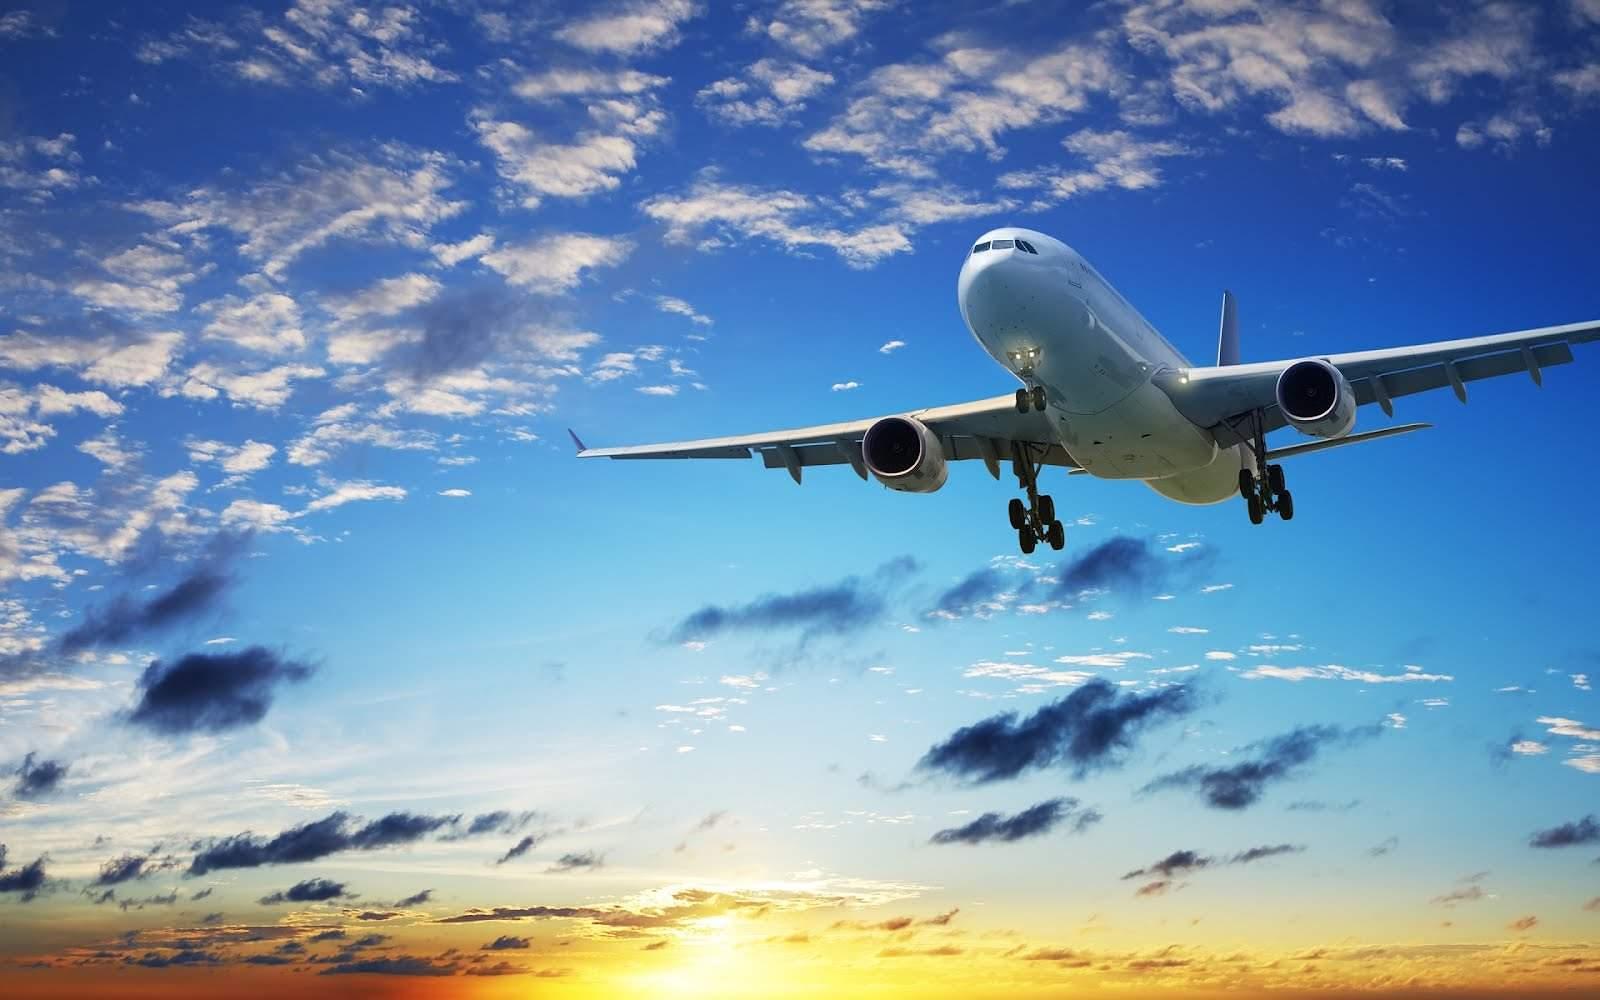 acuerdan-directores-de-aerolineas-facilitar-viajes-a-terceros-paises